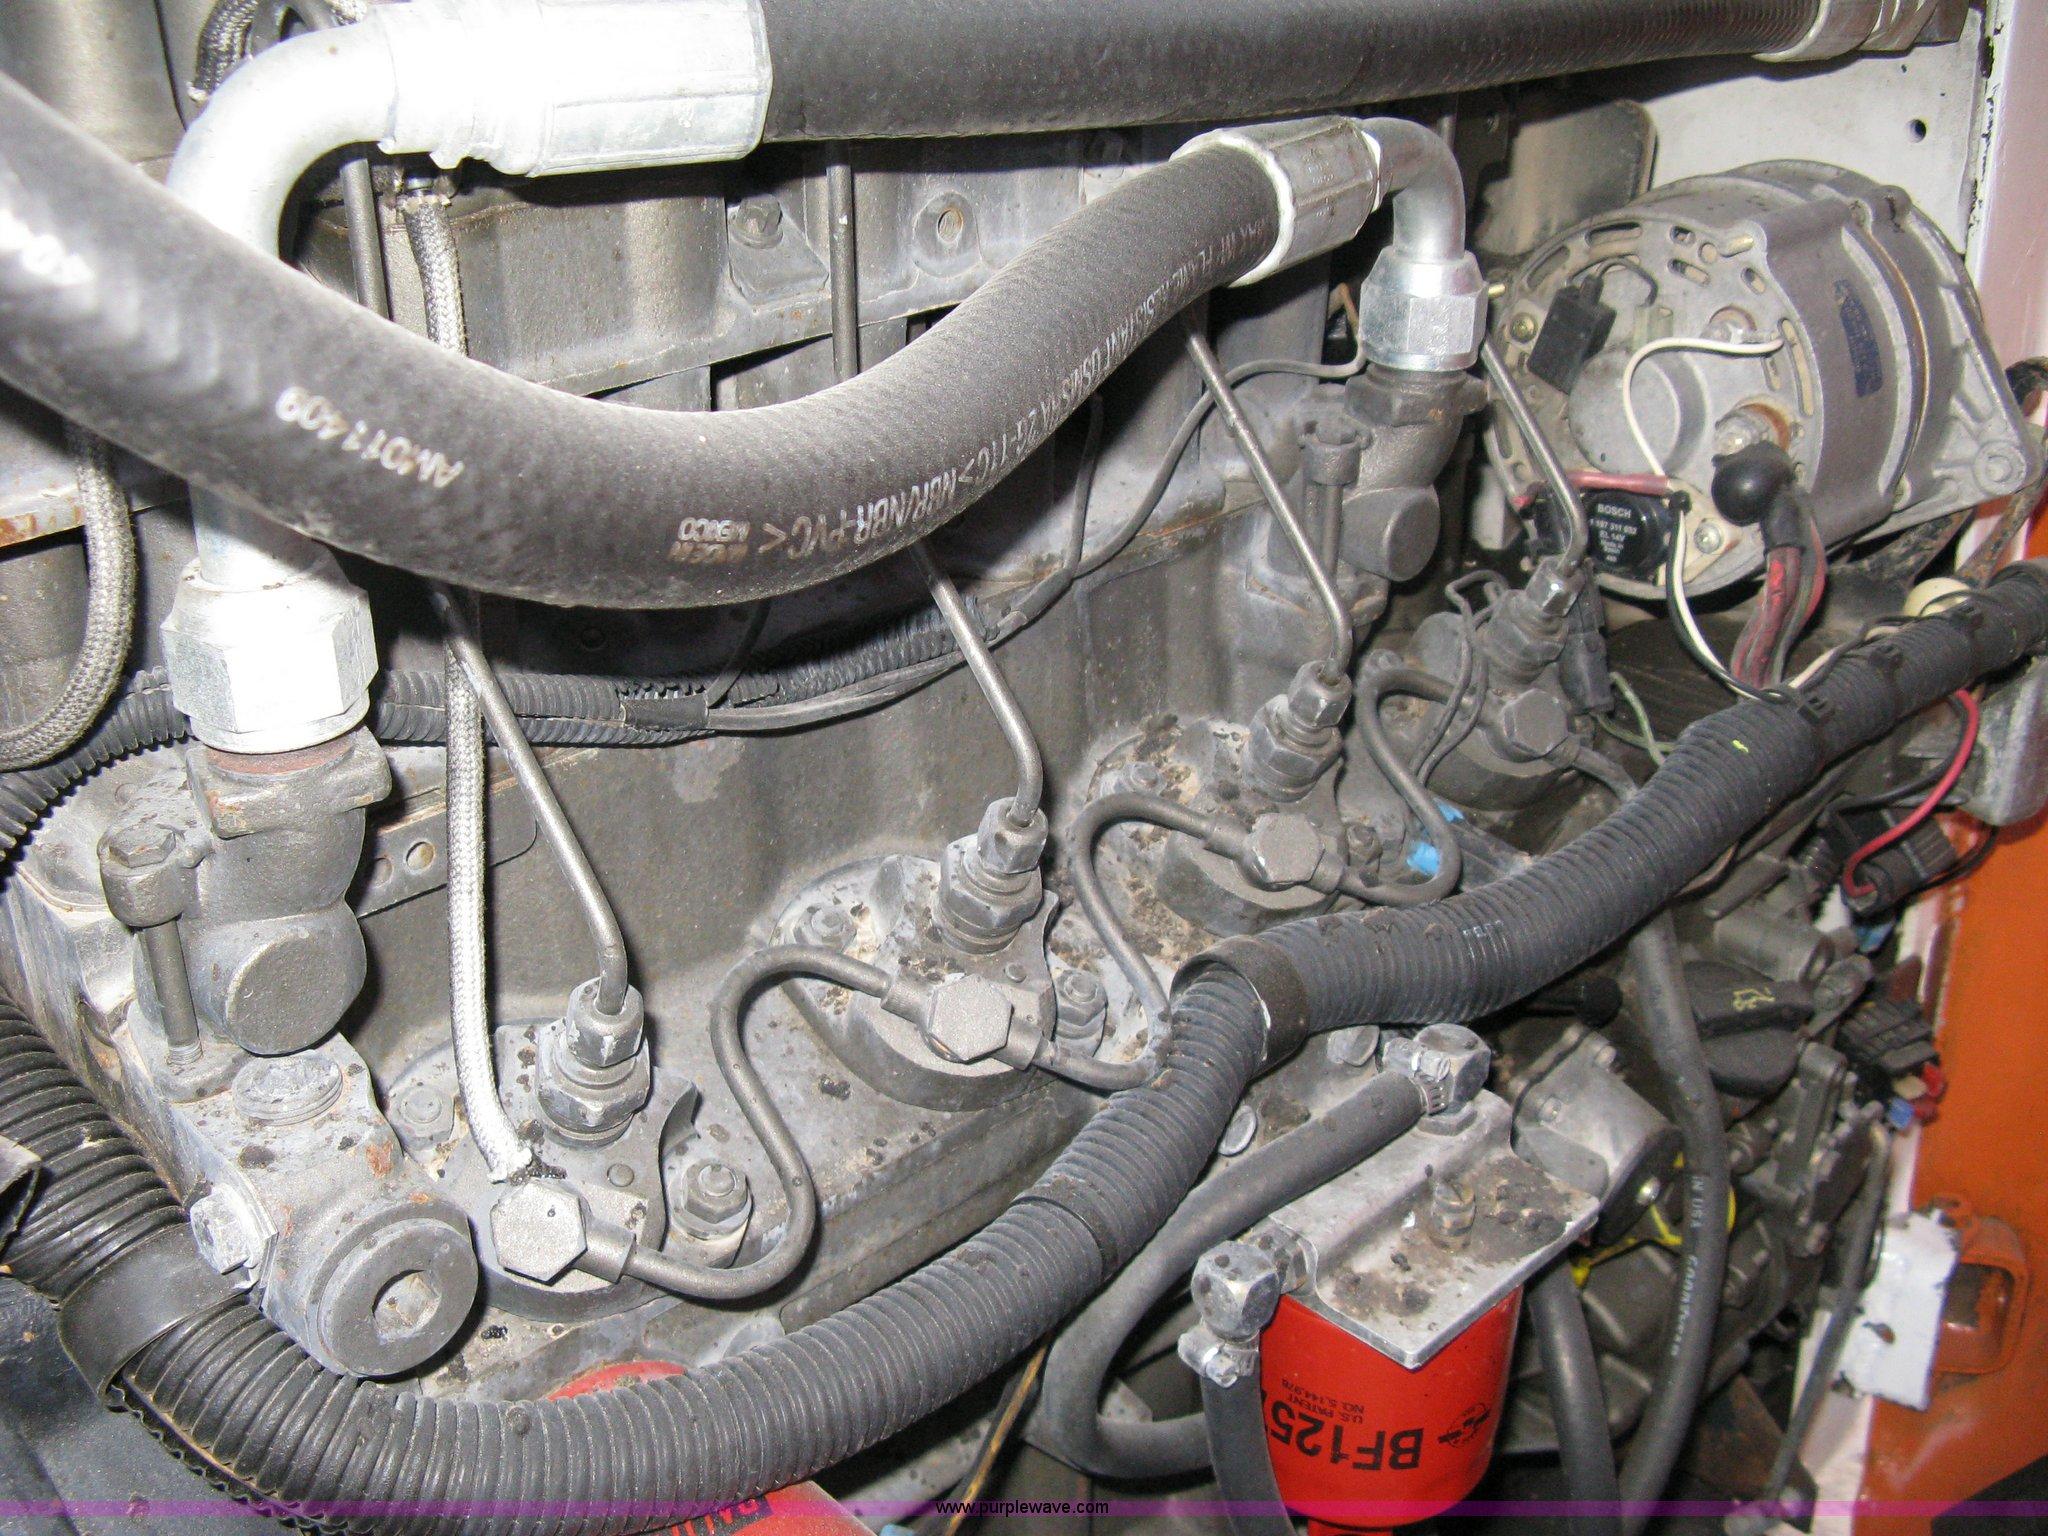 bobcat 863 fuel system diagram wiring diagram rh wt rundumhund aktiv de